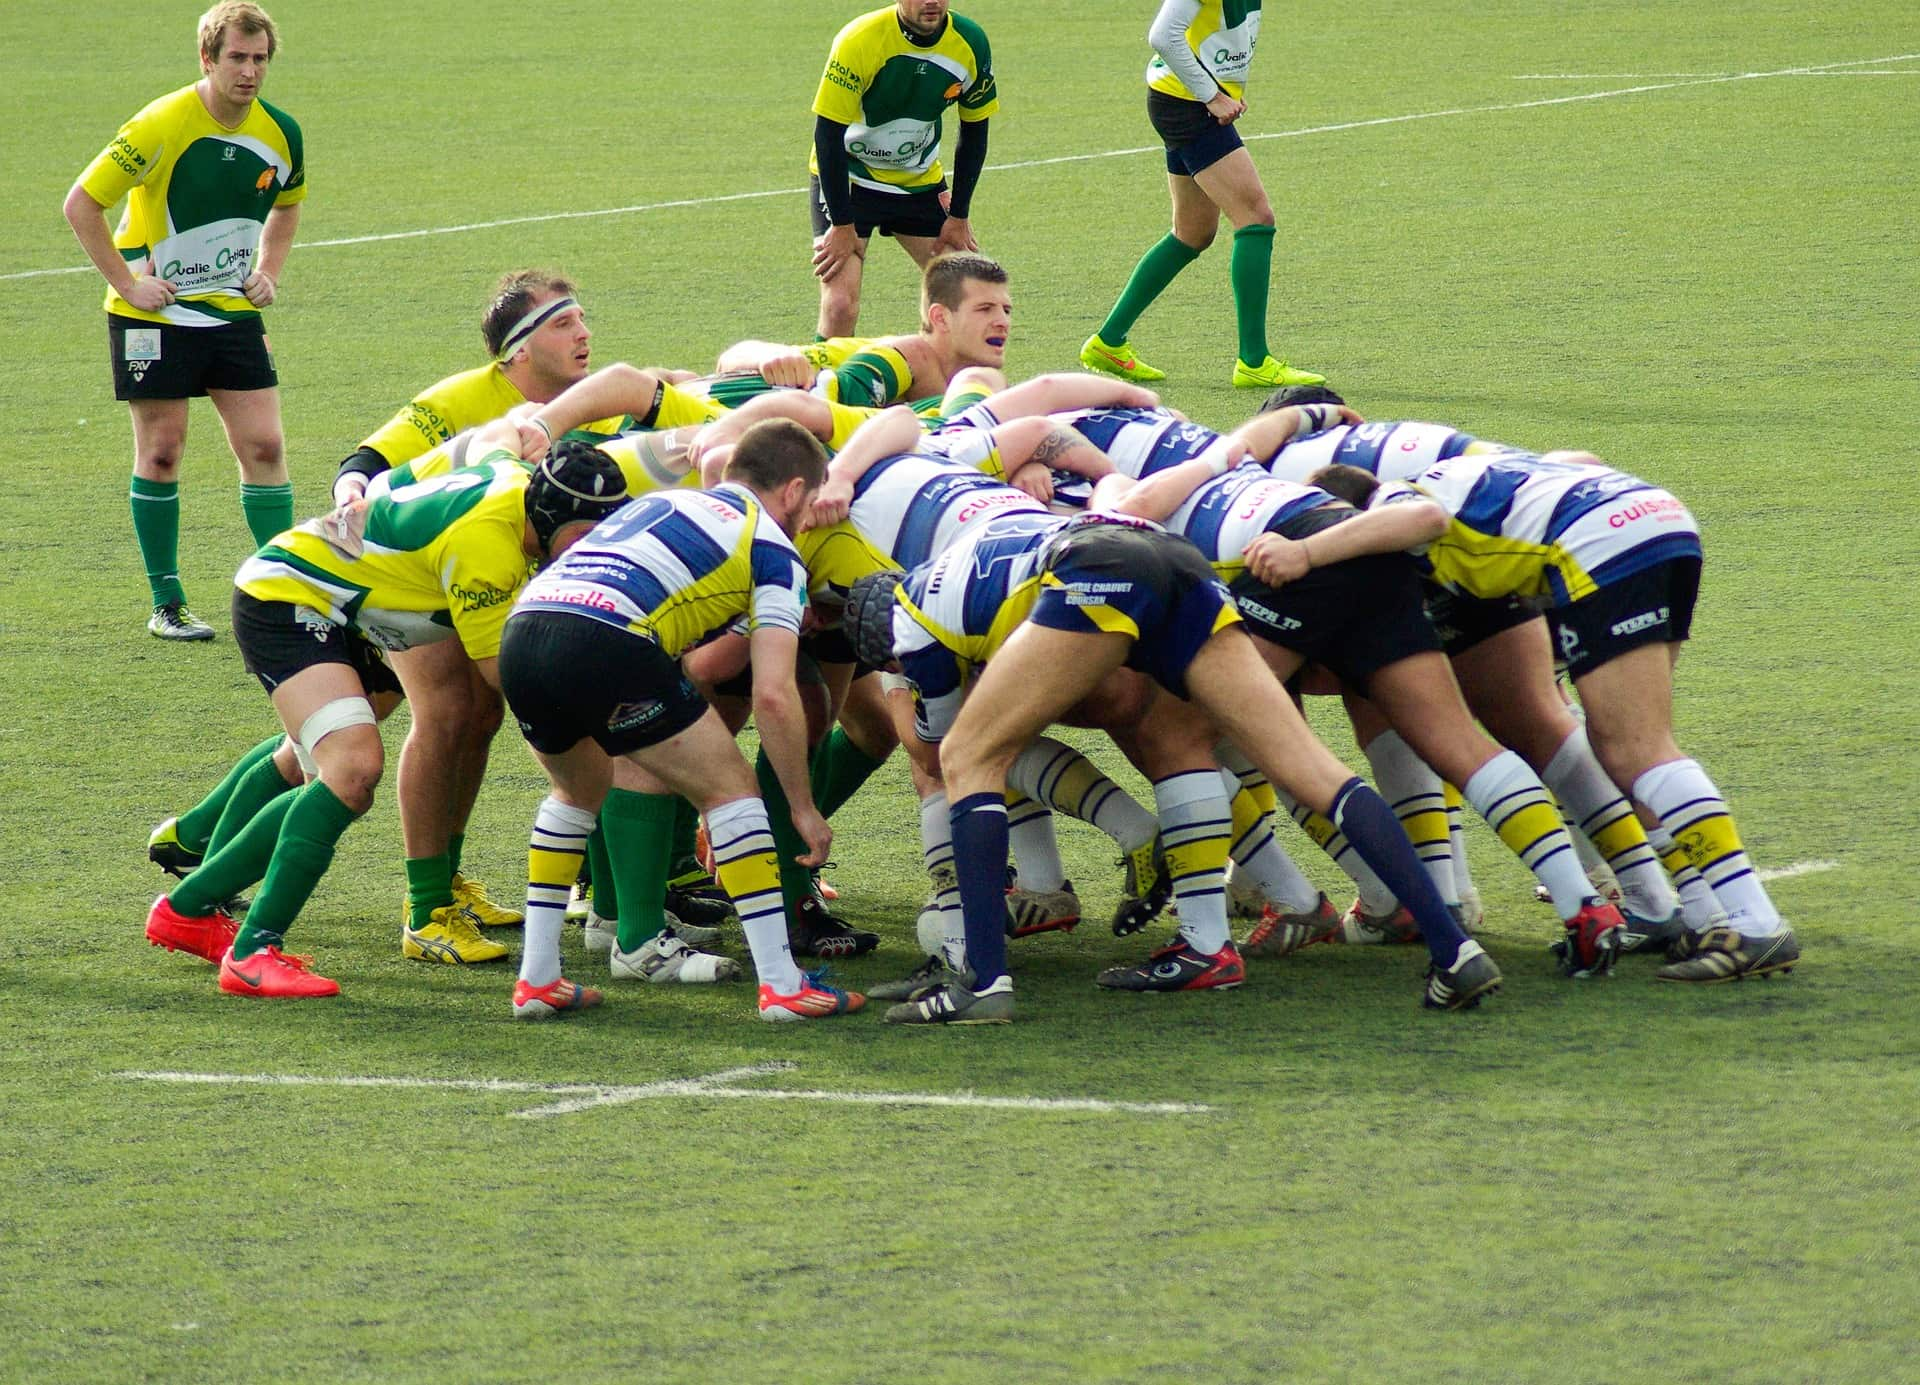 rugby-655016_1920-min.jpg